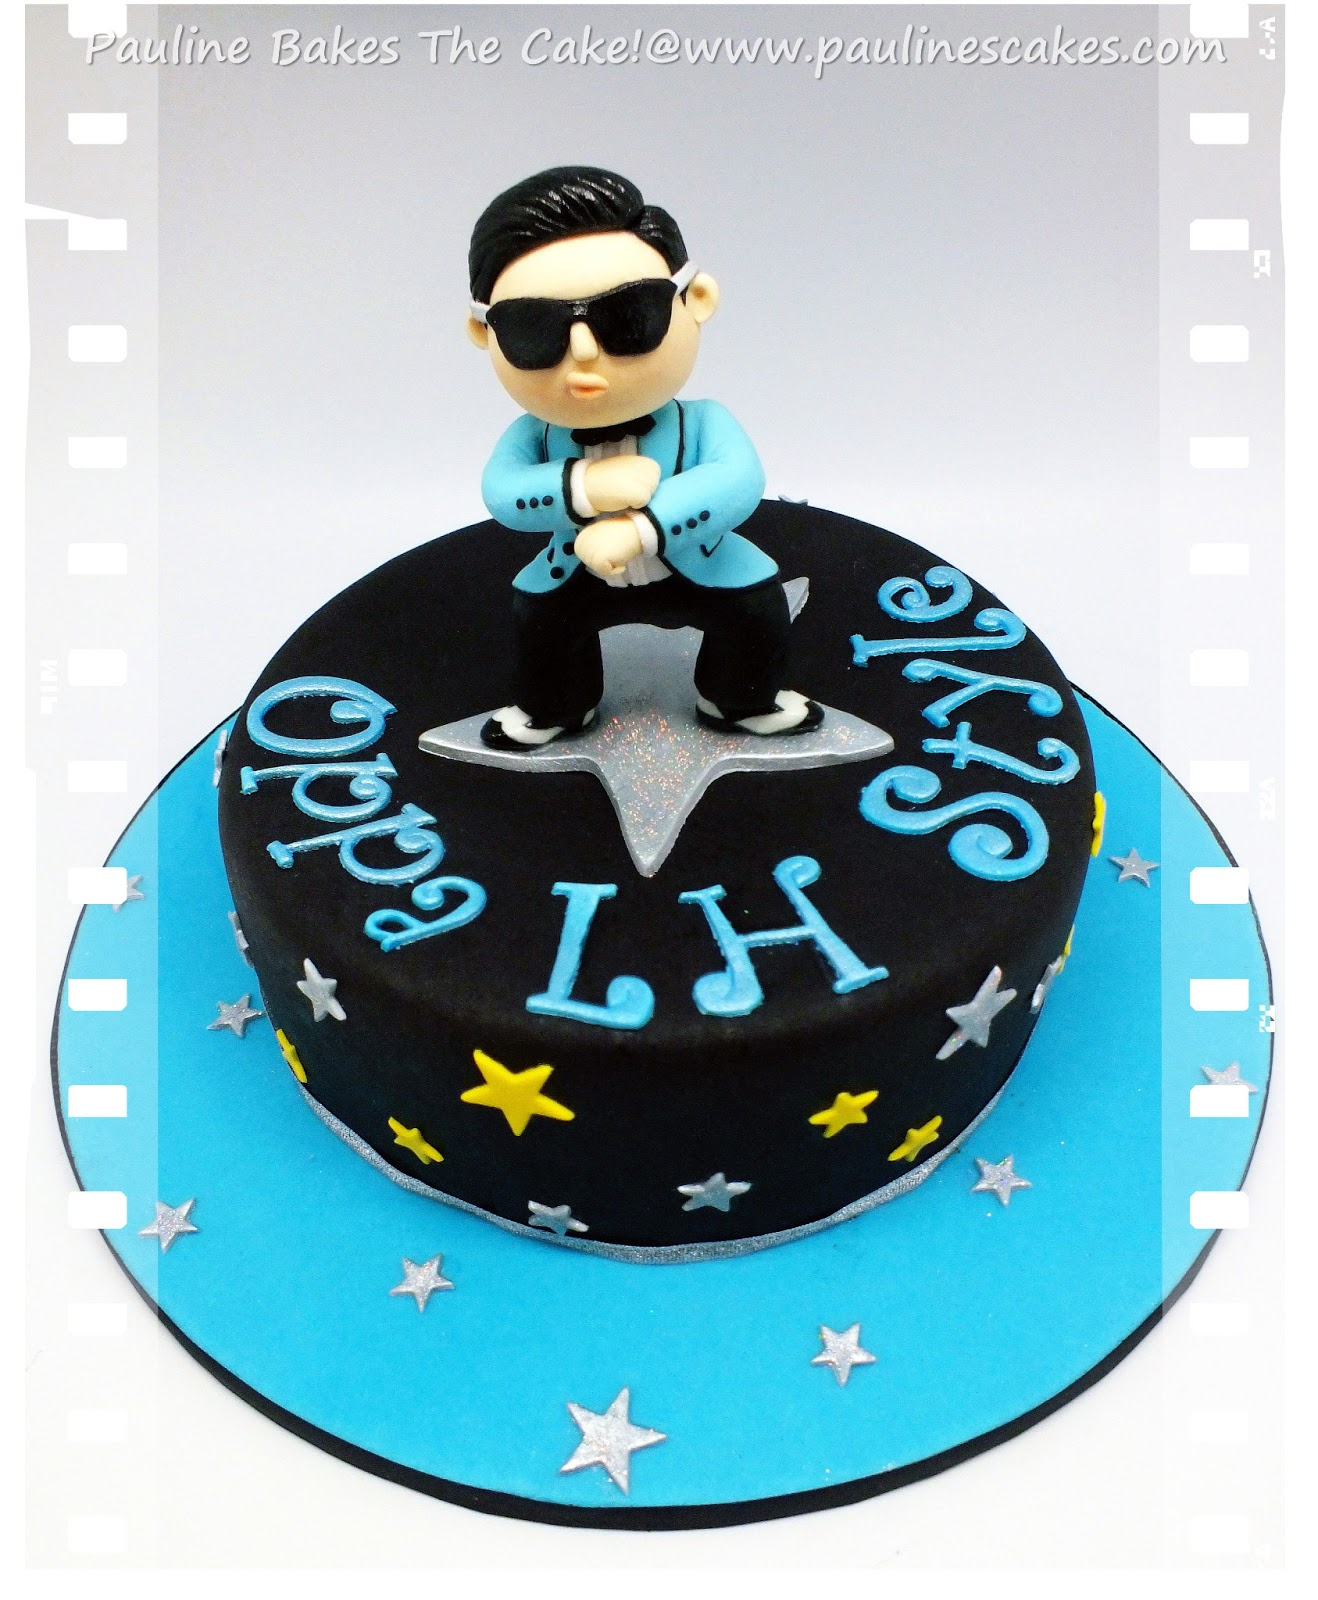 PAULINE BAKES THE CAKE PSY Gangnam Style Cake